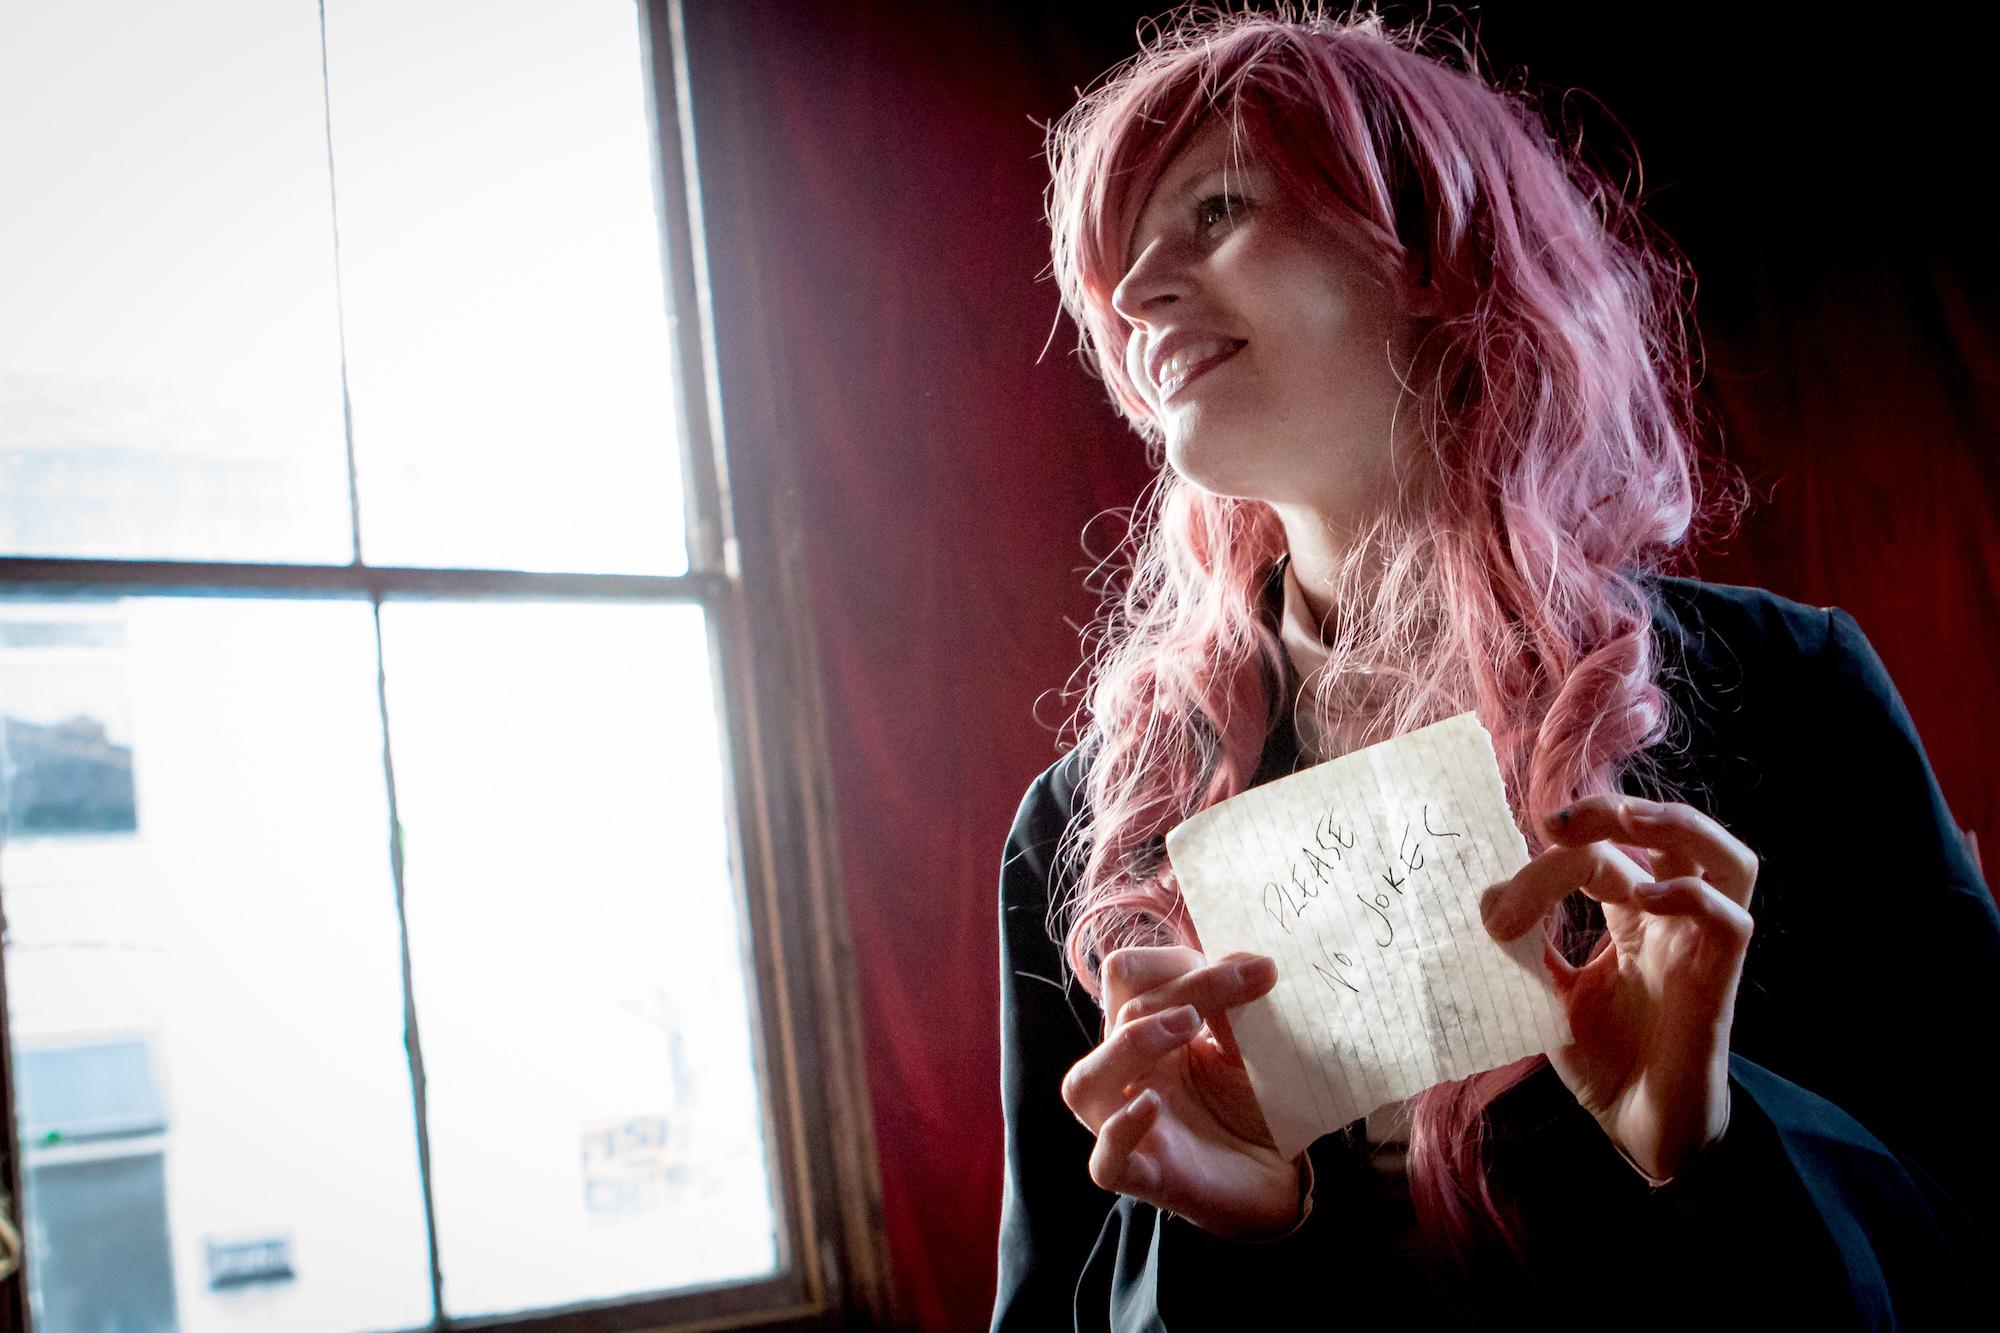 Jenny Hval, Gullivers Manchester, June 2015